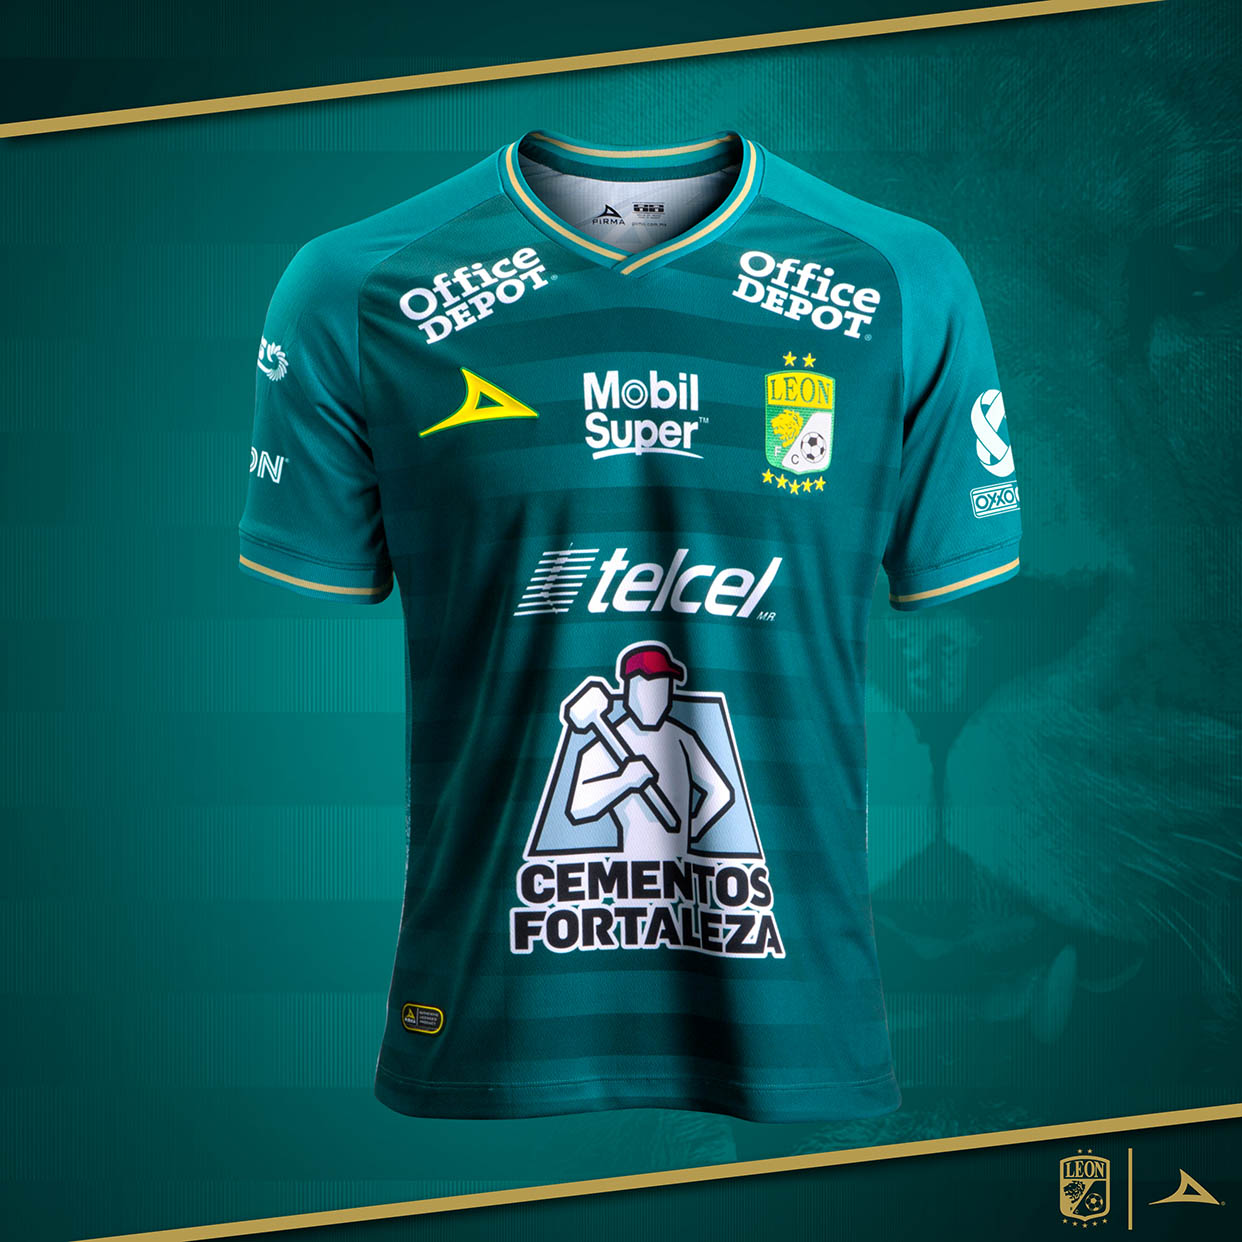 Camisas do Club León 2020-2021 Pirma Titular